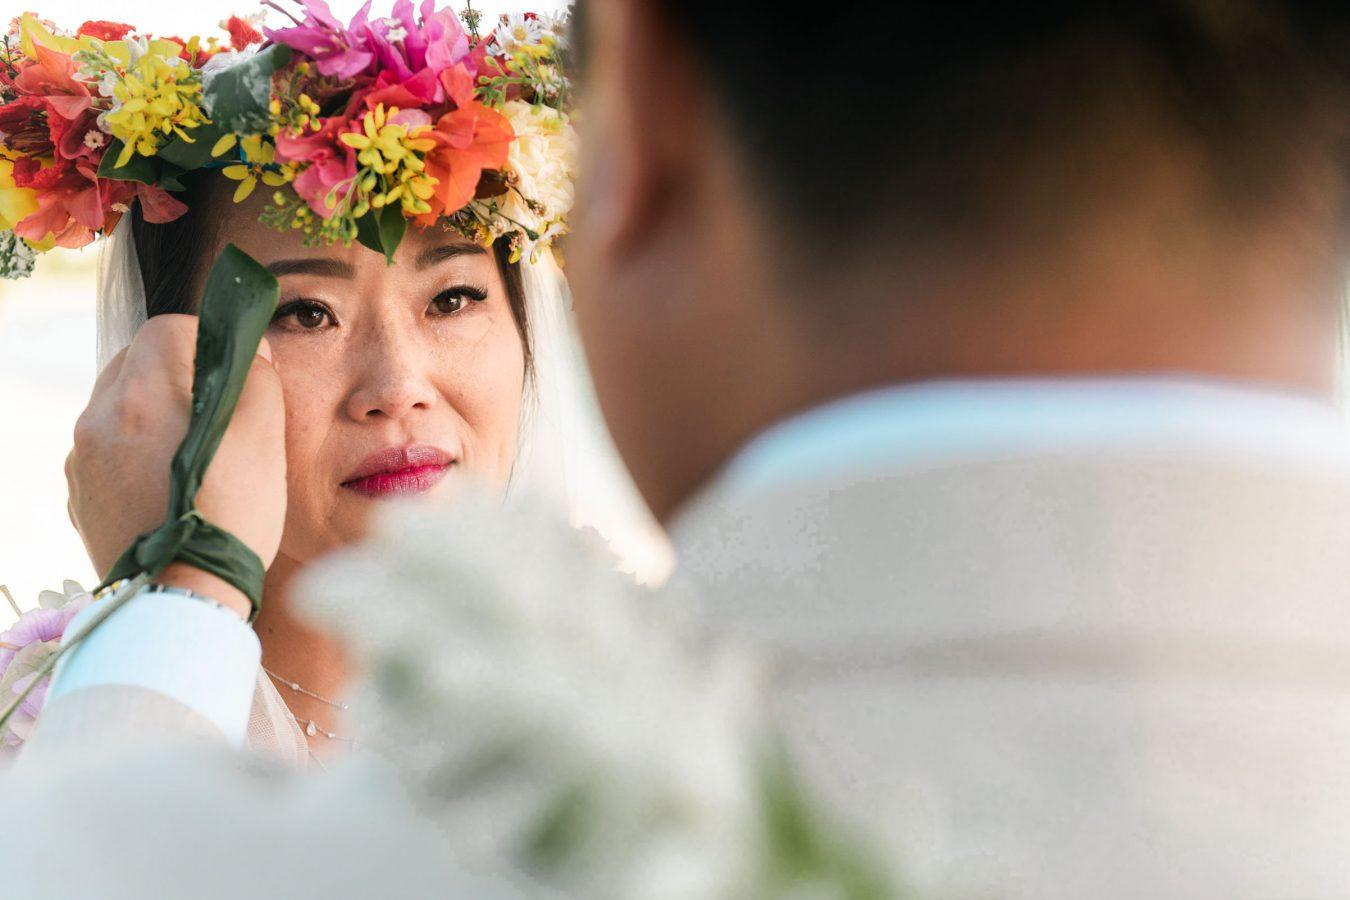 Crying bride at the Four Seasons Bora Bora